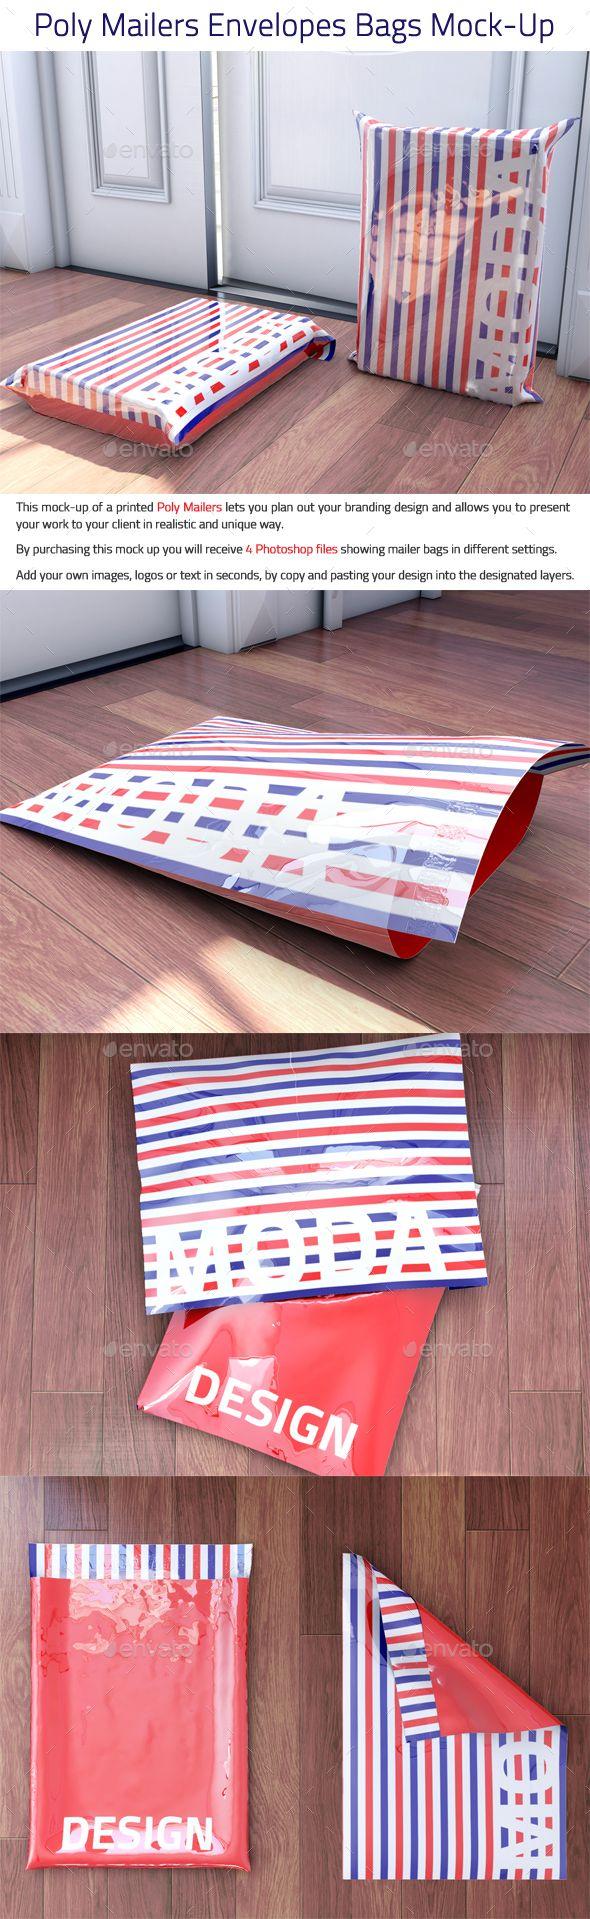 Poly Mailers Envelopes Bags MockUp  Envelopes Mockup And Bag